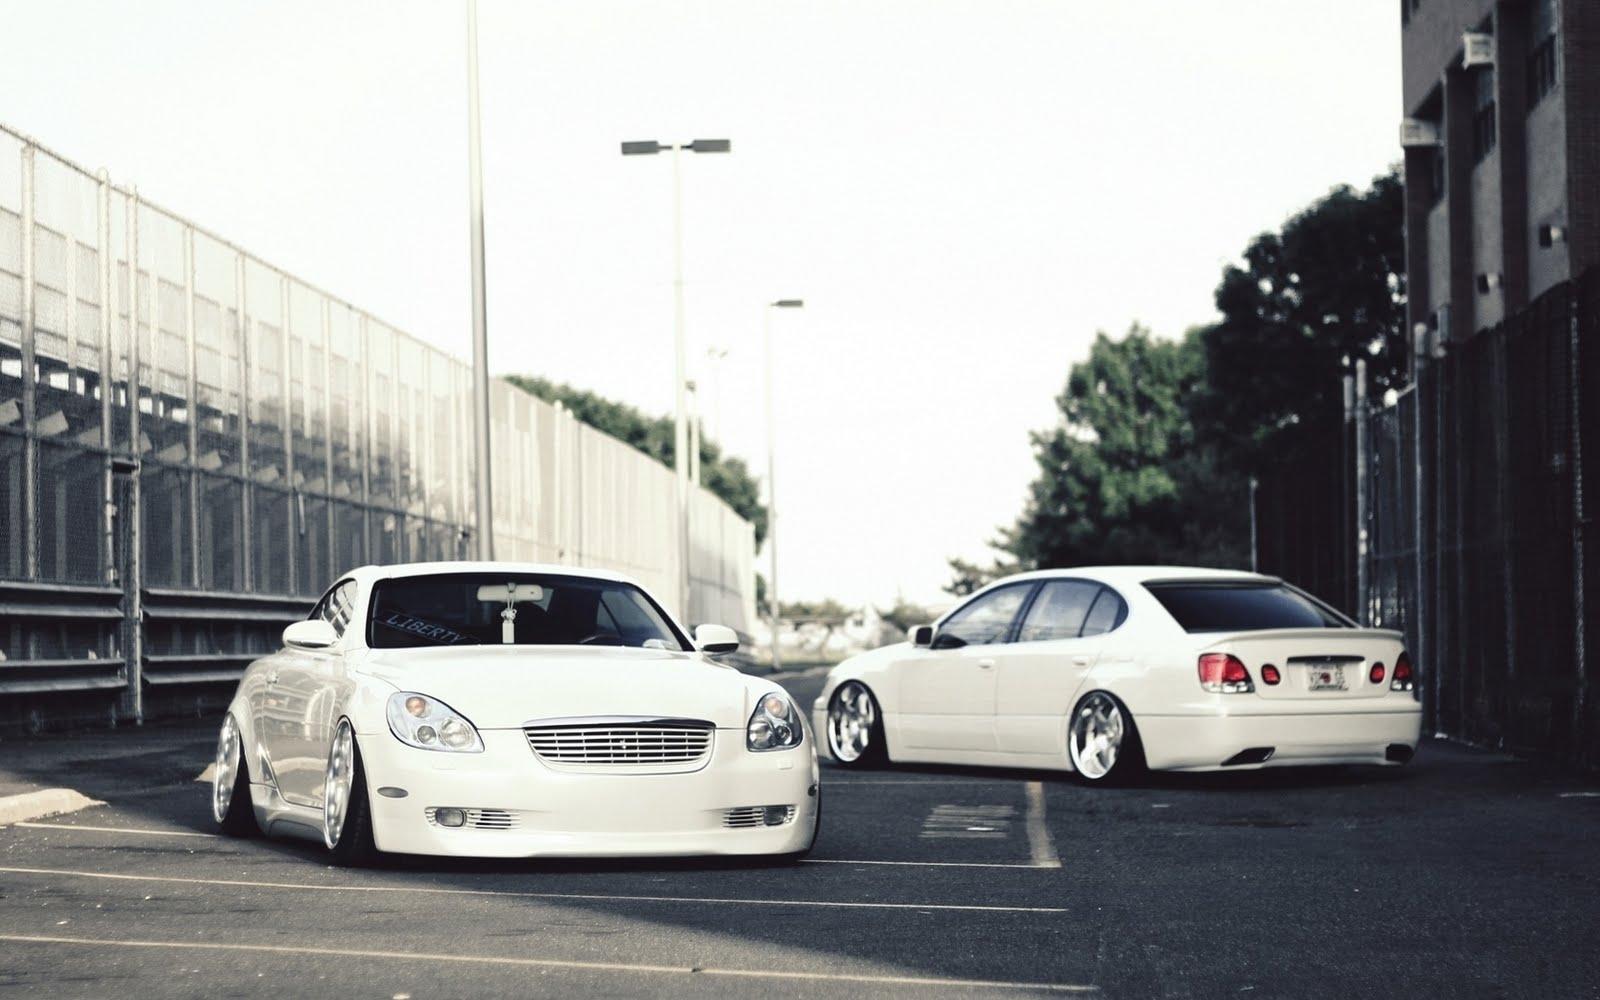 Lexus Vip Style Cars White Tuning Hd Wallpaper Lexus Vip 1600x1000 Download Hd Wallpaper Wallpapertip